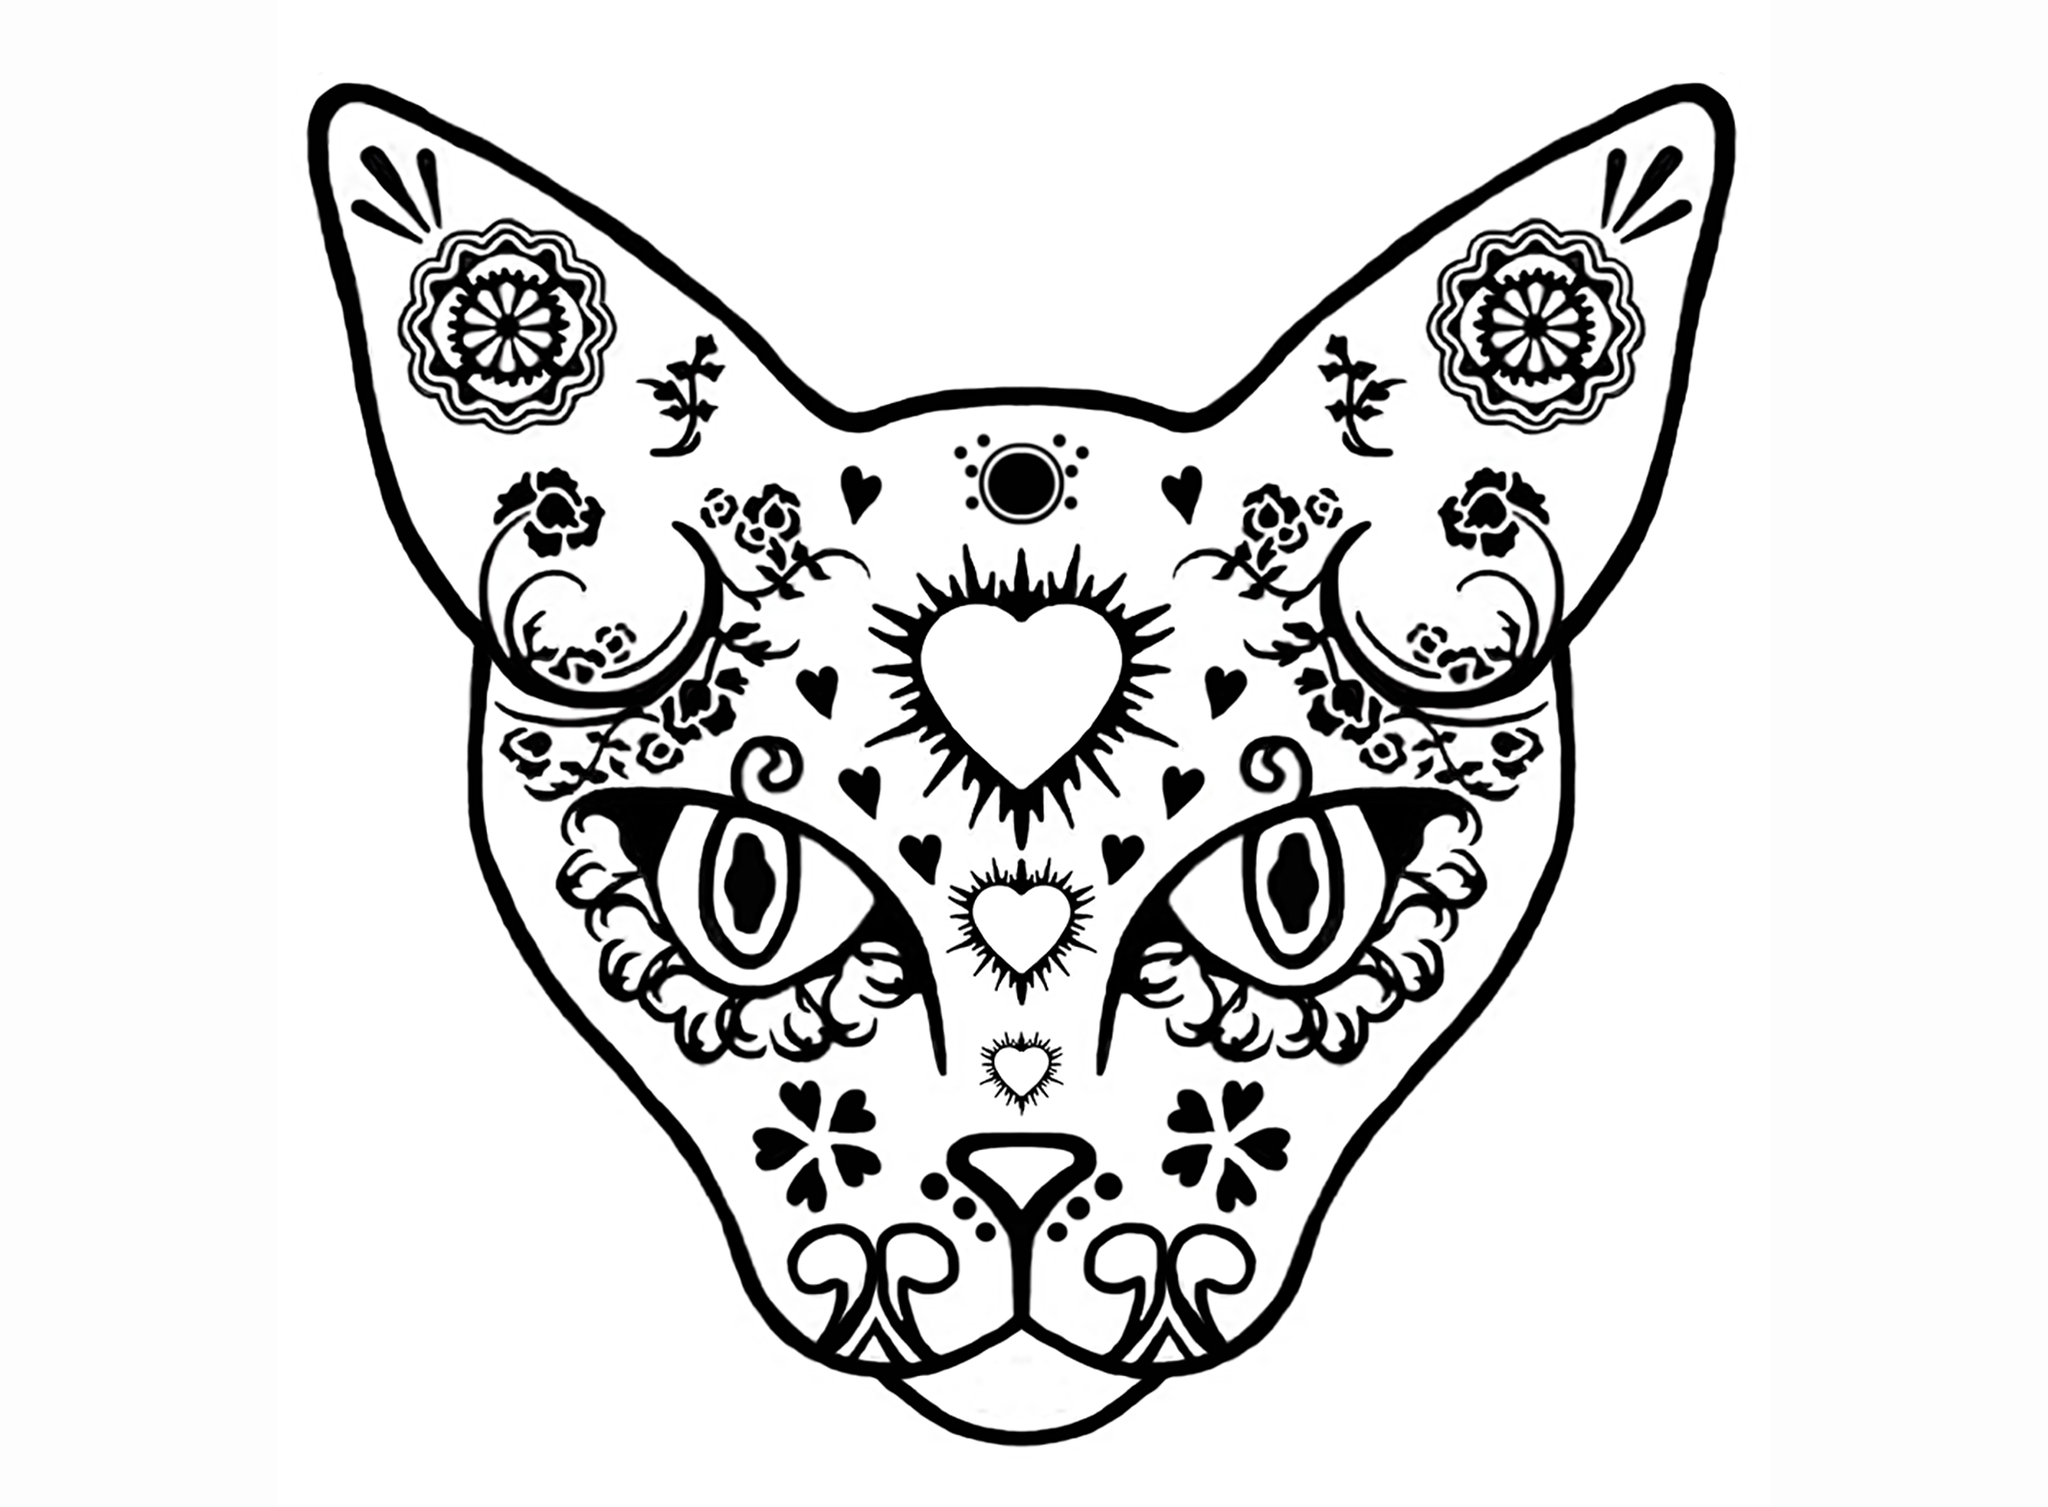 Cat Sugar Skull 2 Pcs 3 Black 651 Or White 600 Fused